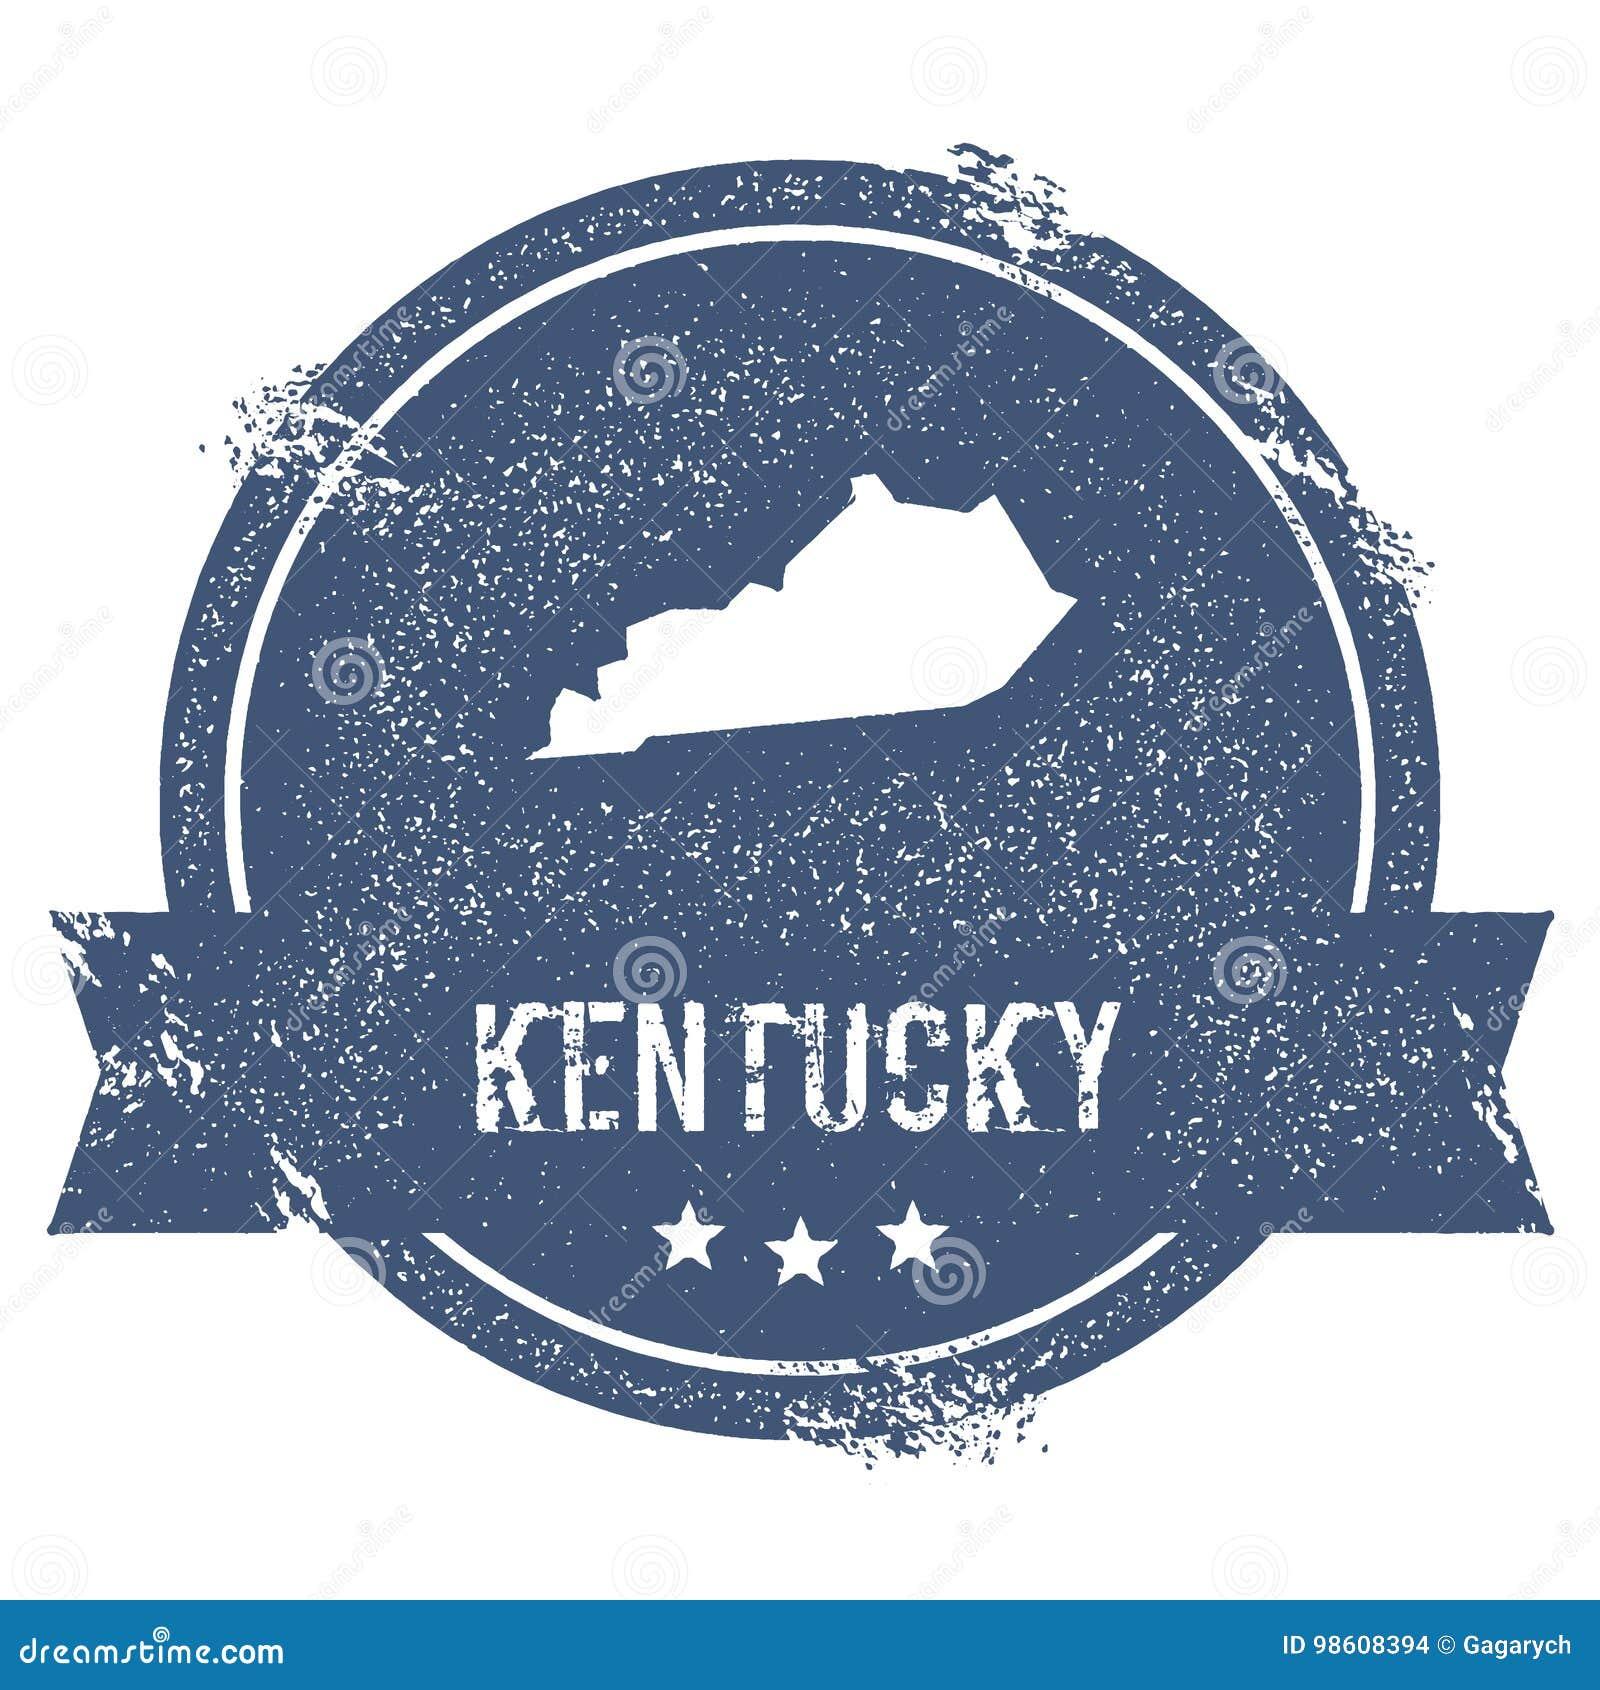 Kentucky State Map Globe on indiana map, virginia state map, massachusetts state map, minnesota map, louisiana on us map, maine state map, maryland state map, tenn state map, louisiana state map, pennsylvania state map, arkansas state map, south dakota state map, colorado state map, louisville map, texas state map, kentucky capitol building, tennessee map, new york state map, u.s map, arizona state map,